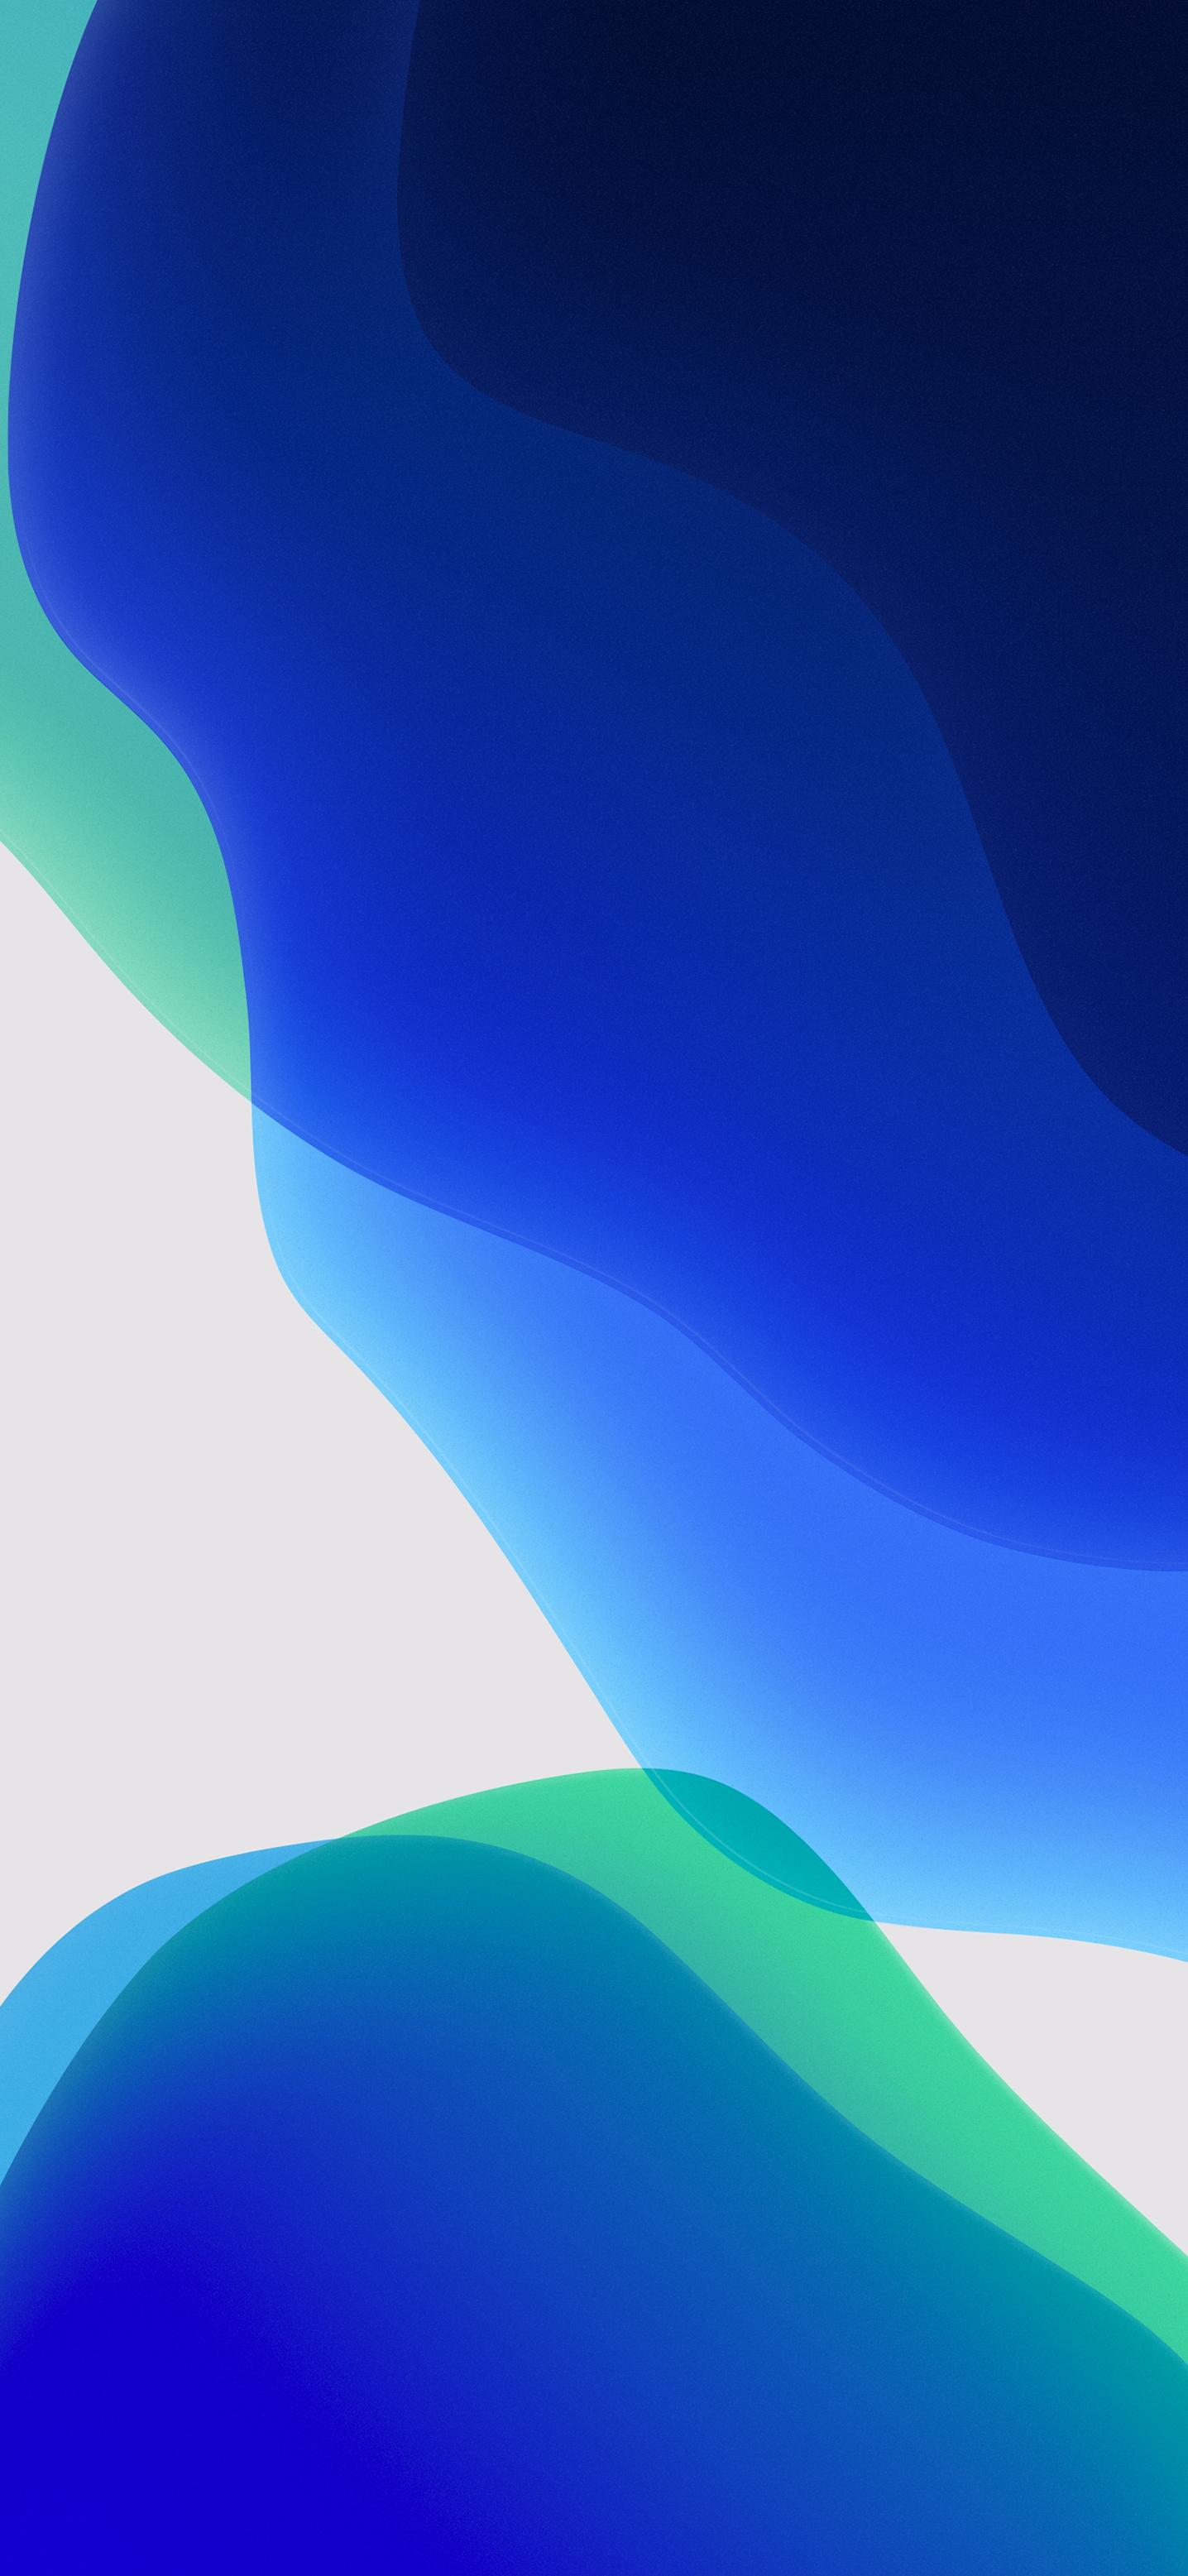 iOS 13 Official Stock Wallpaper (Ultra HD) - Green Dark ...